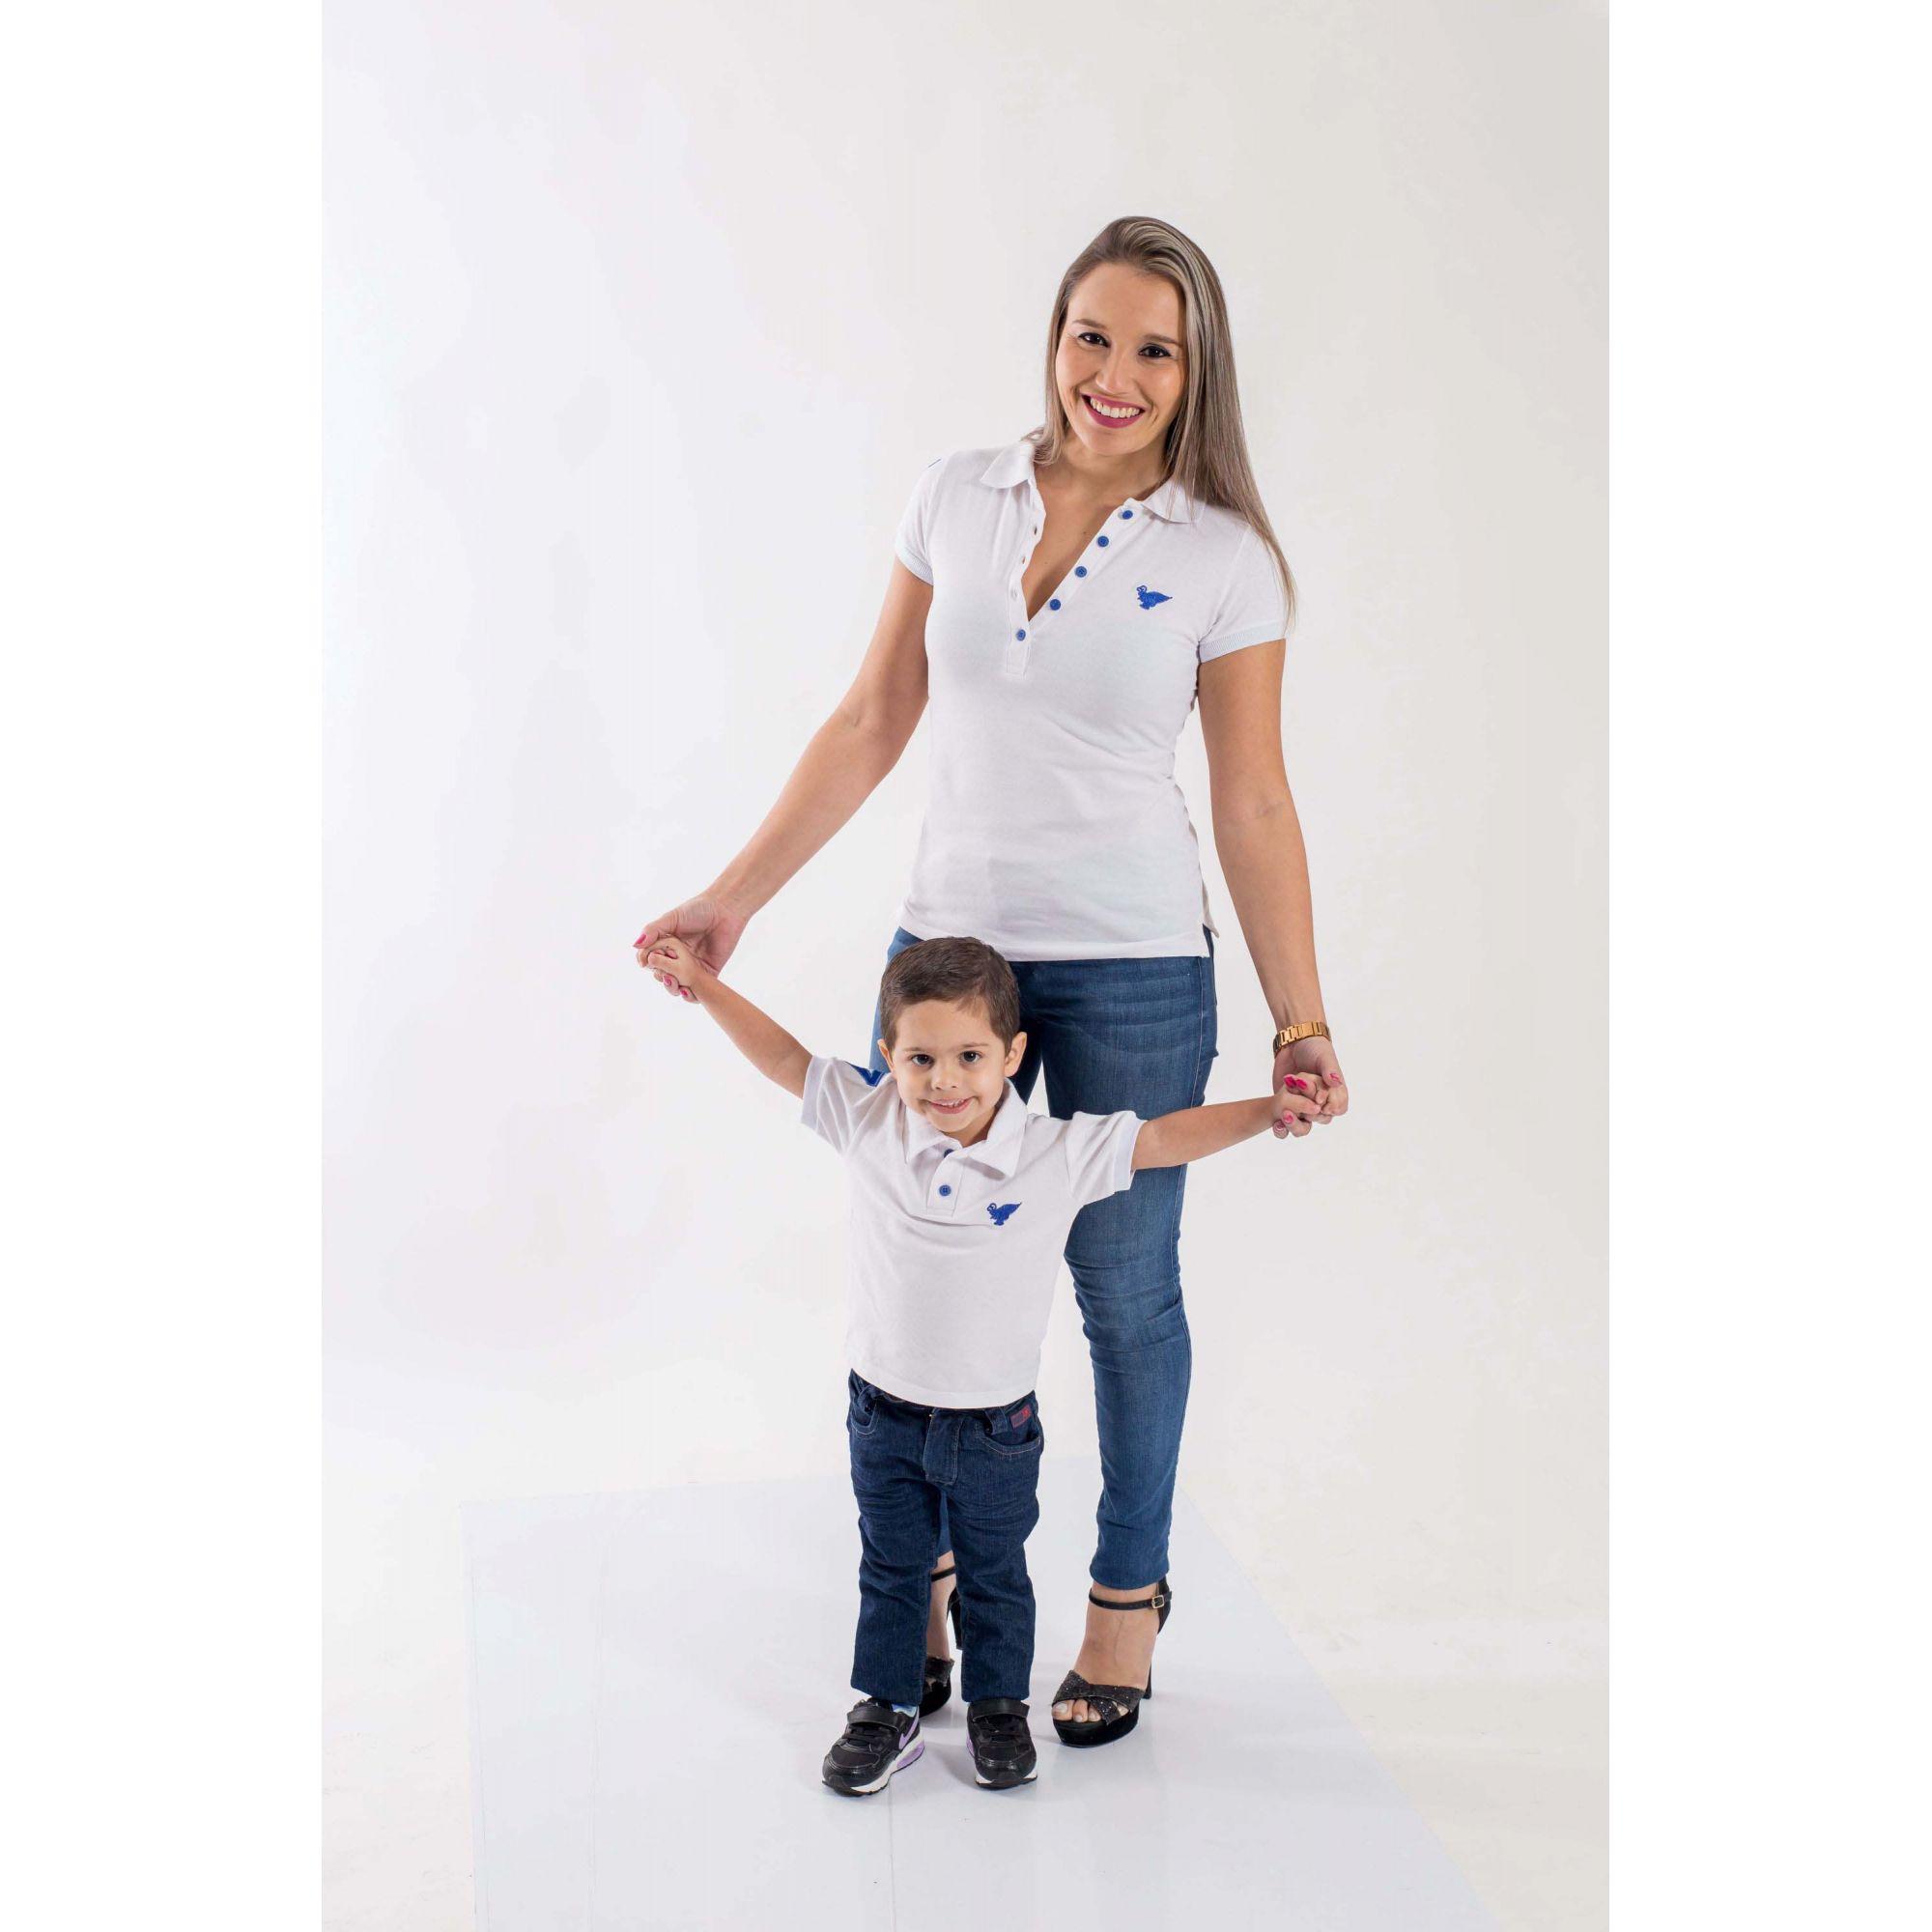 MÃE E FILHO > Kit 02 Peças - Camisas Branca [Coleção Tal Mãe Tal Filho]